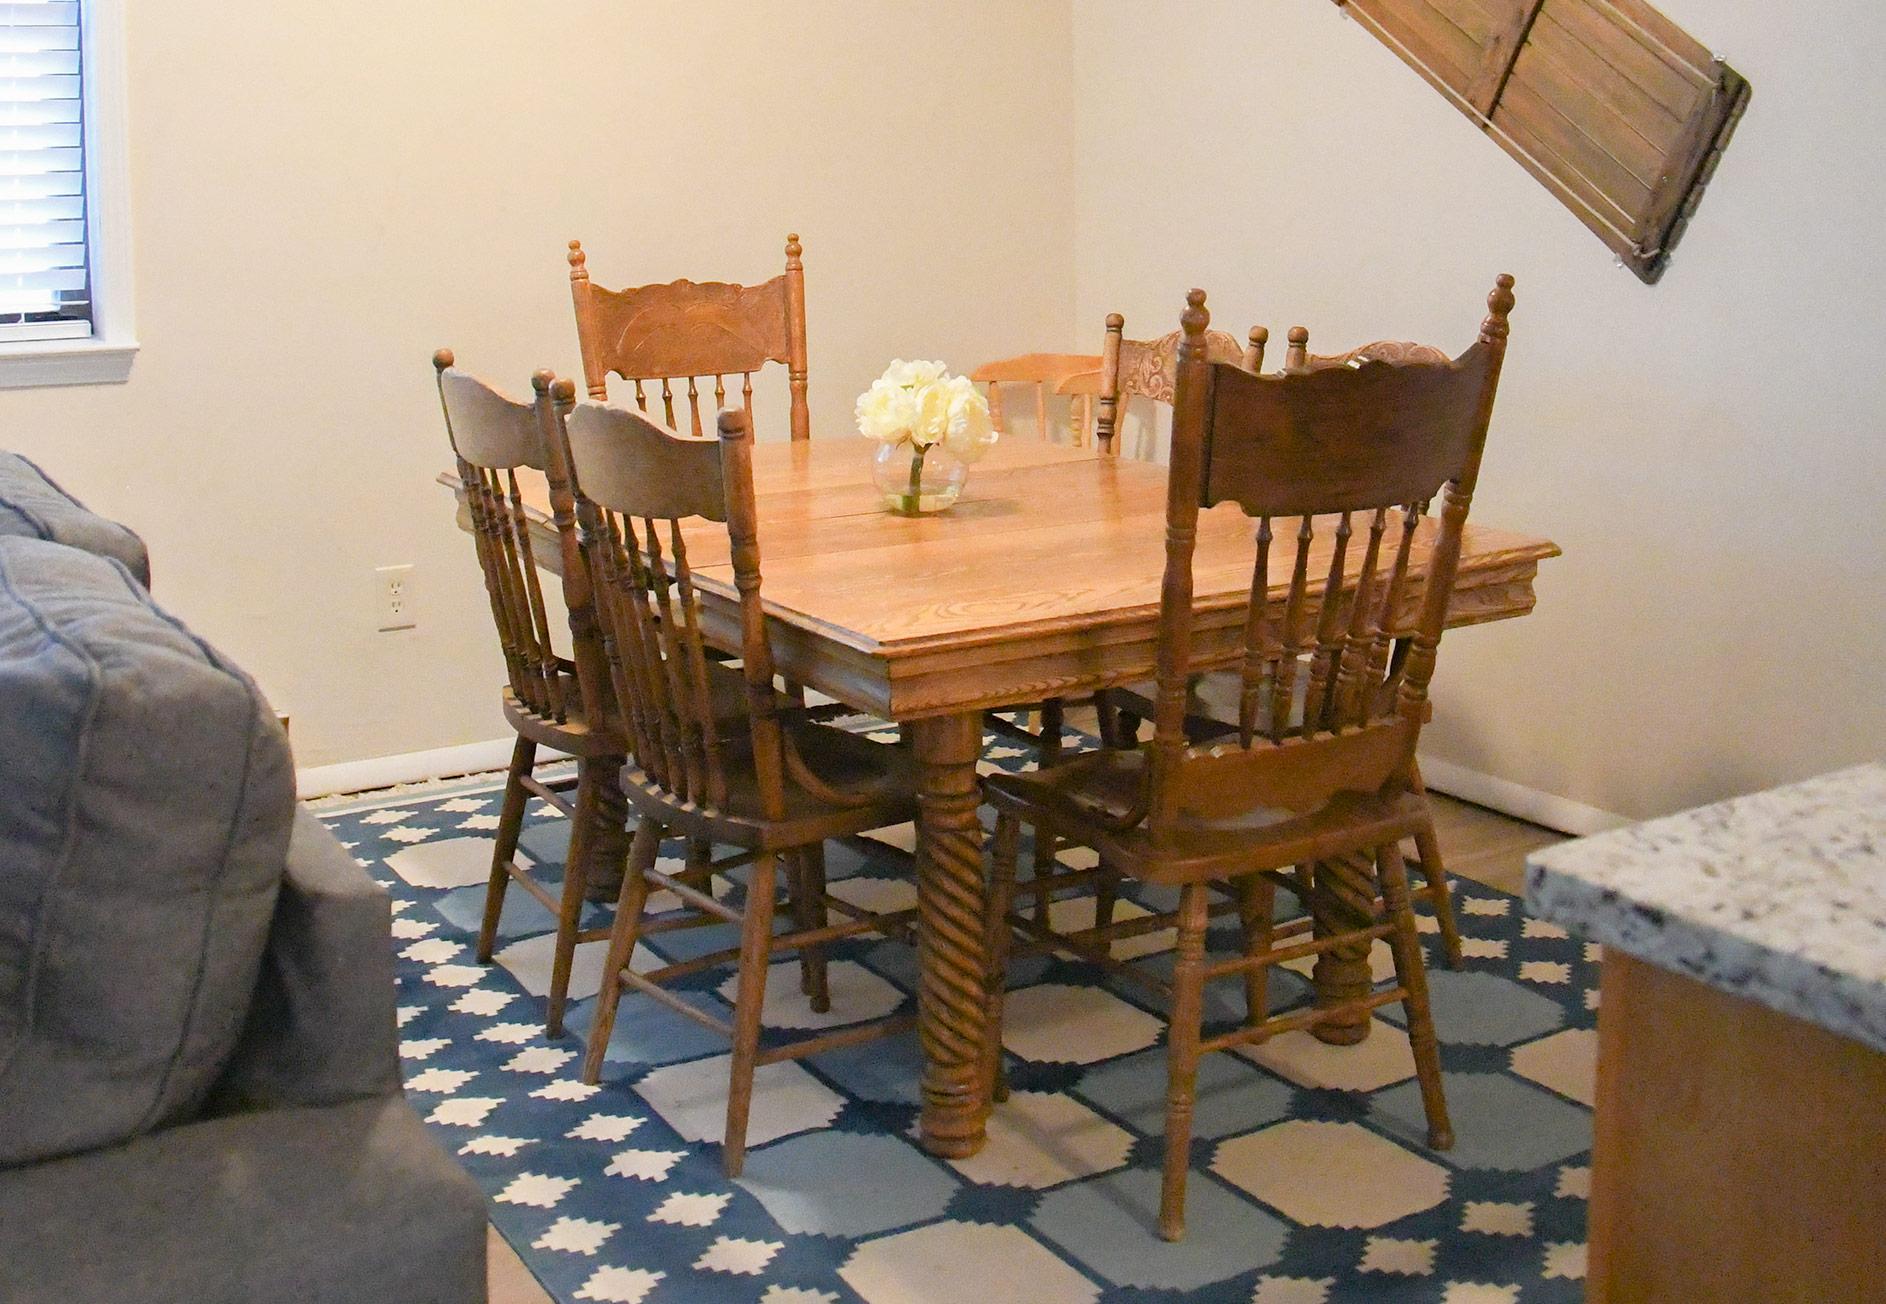 Lake City Rental - Dining Room